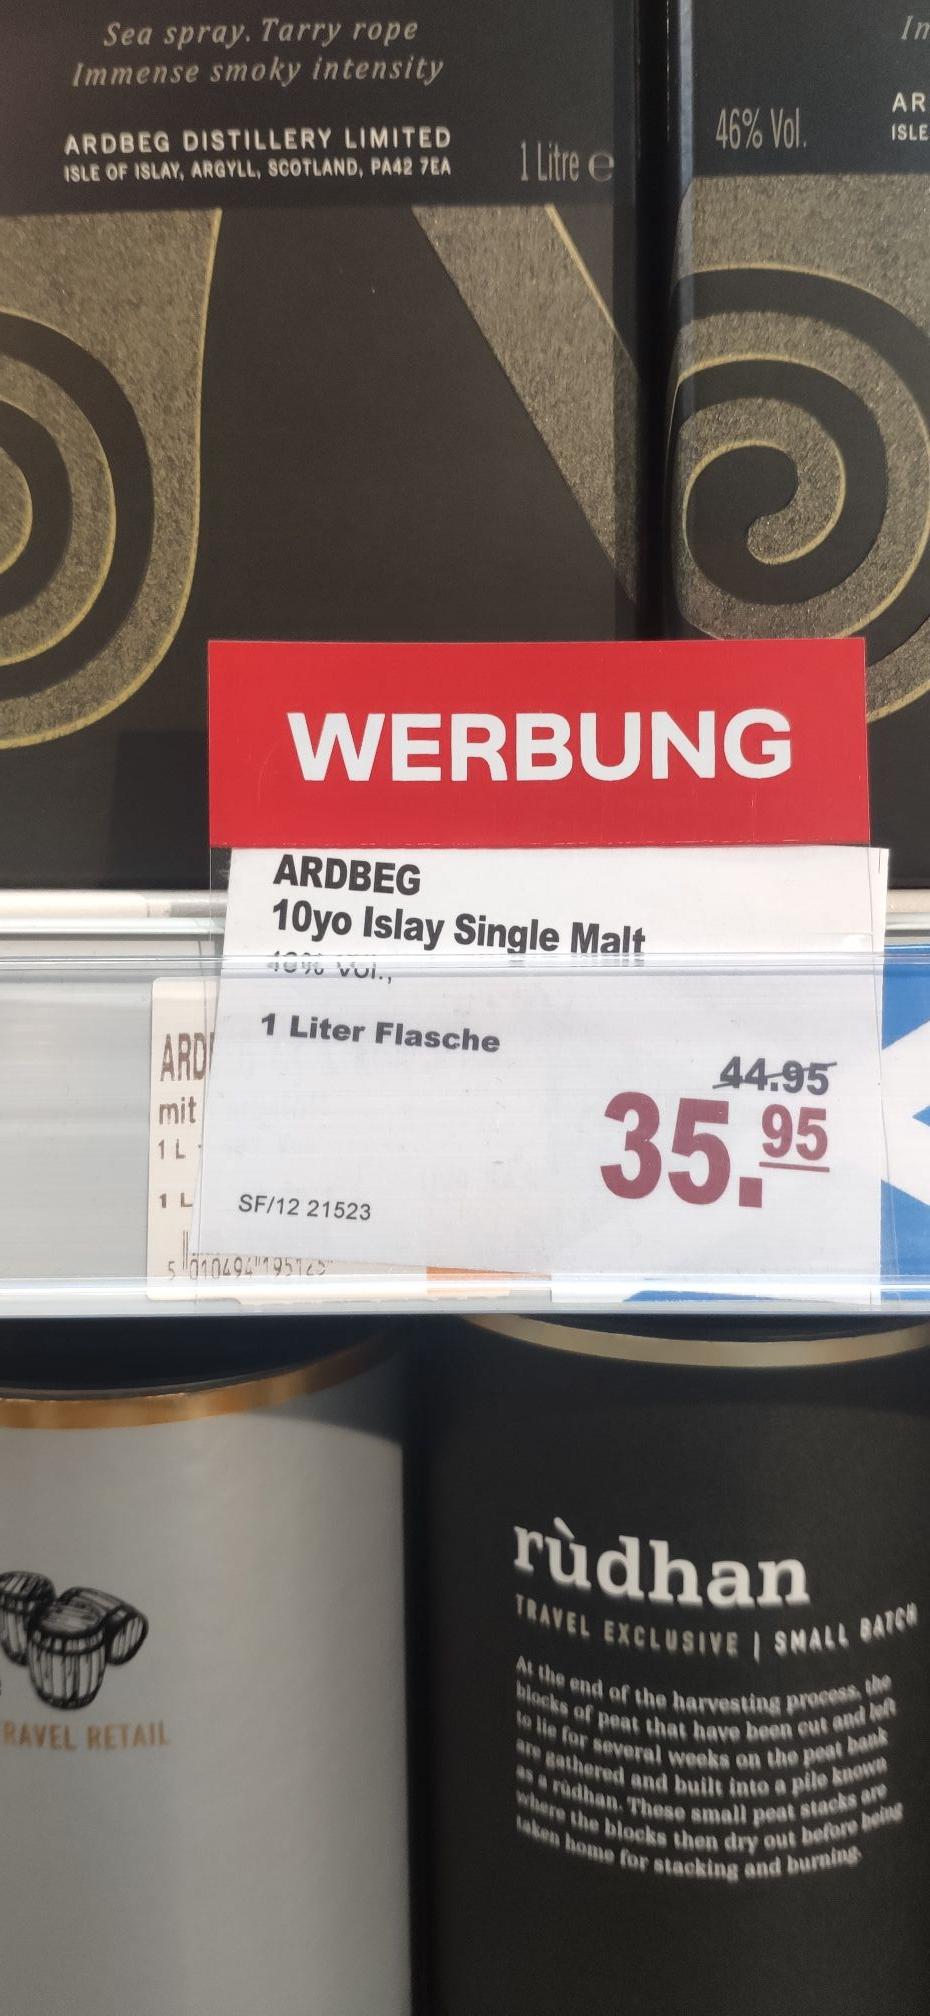 [Düsseldorf Flughafen - Ringeltaube] Lokal? Ardbeg Ten 1.0 Liter